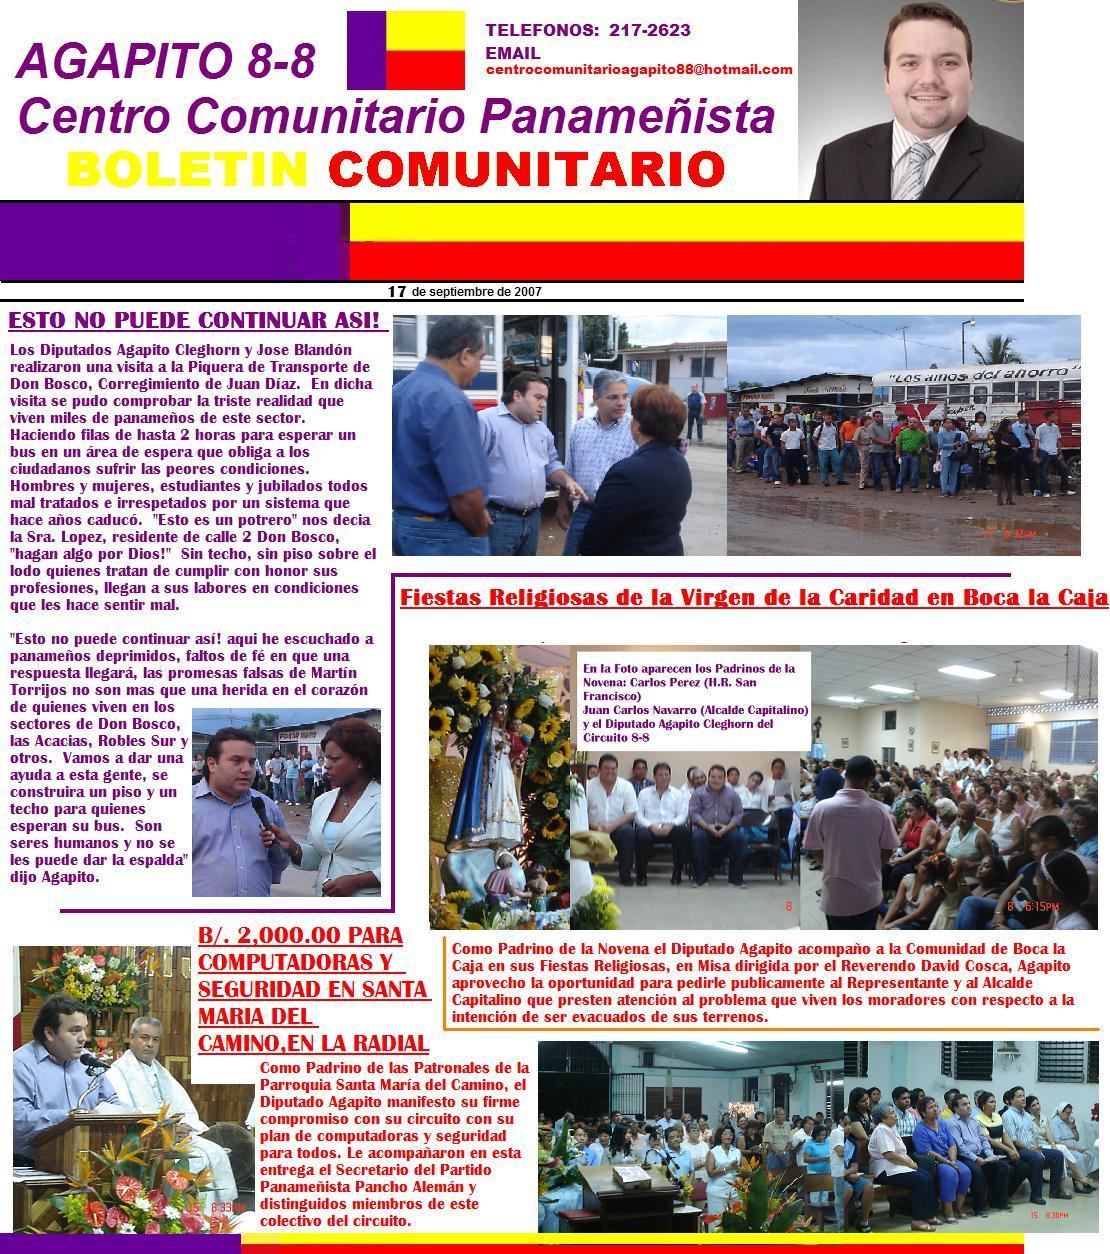 DIPUTADO AGAPITO CLEGHORN PRESENTA SU BOLETIN COMUNITARIO